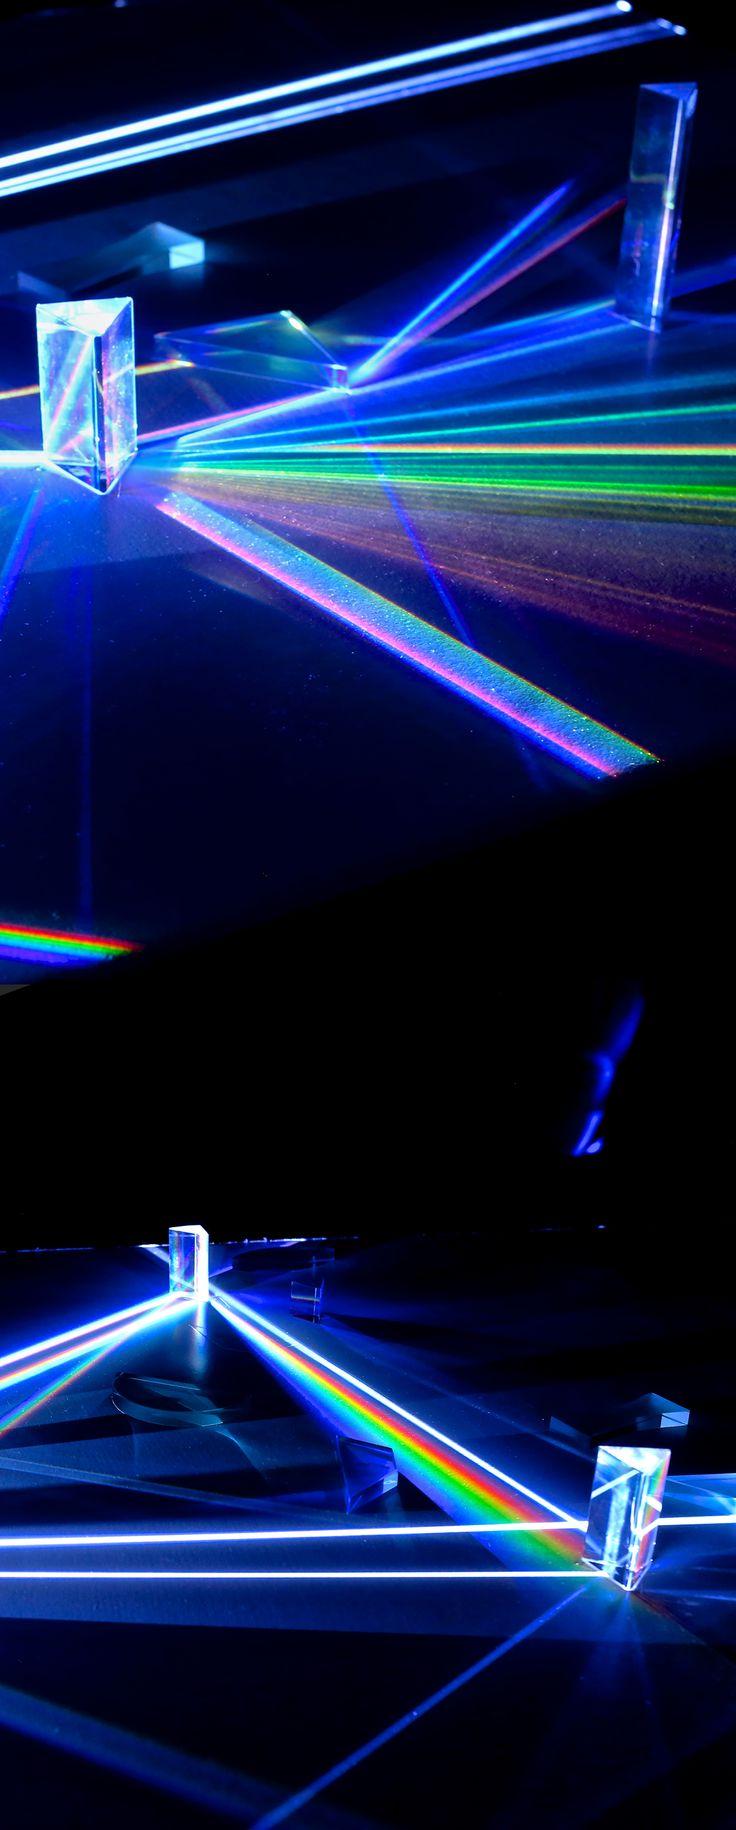 http://network.artcenter.edu/gallery/23740099/cornfields-prism-light-installation